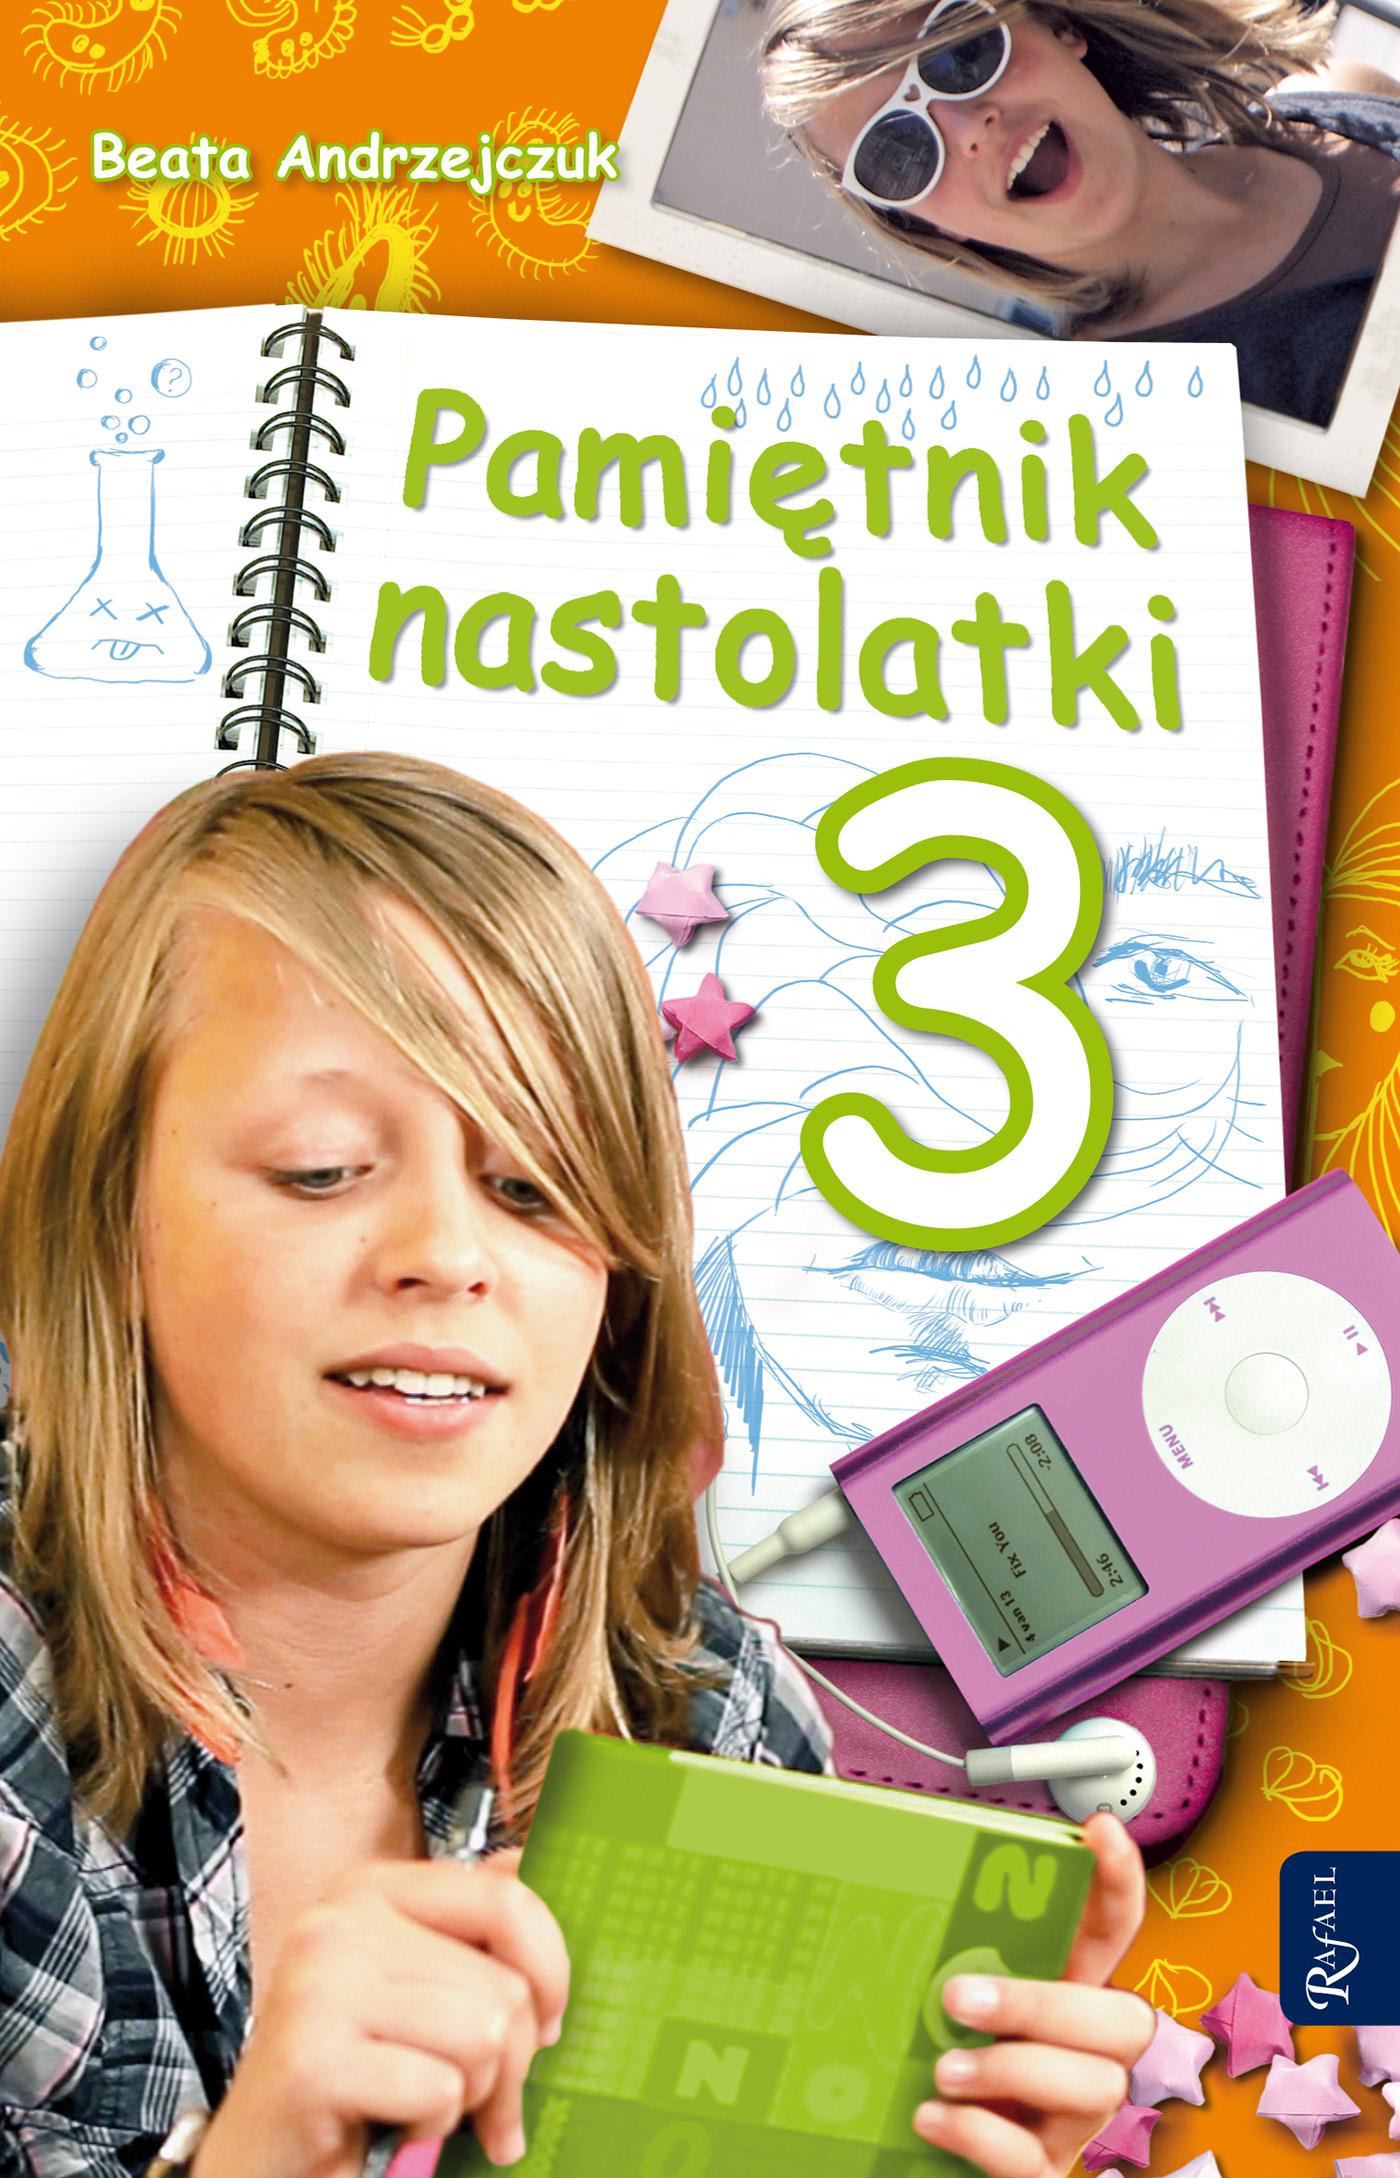 Pamiętnik nastolatki 3